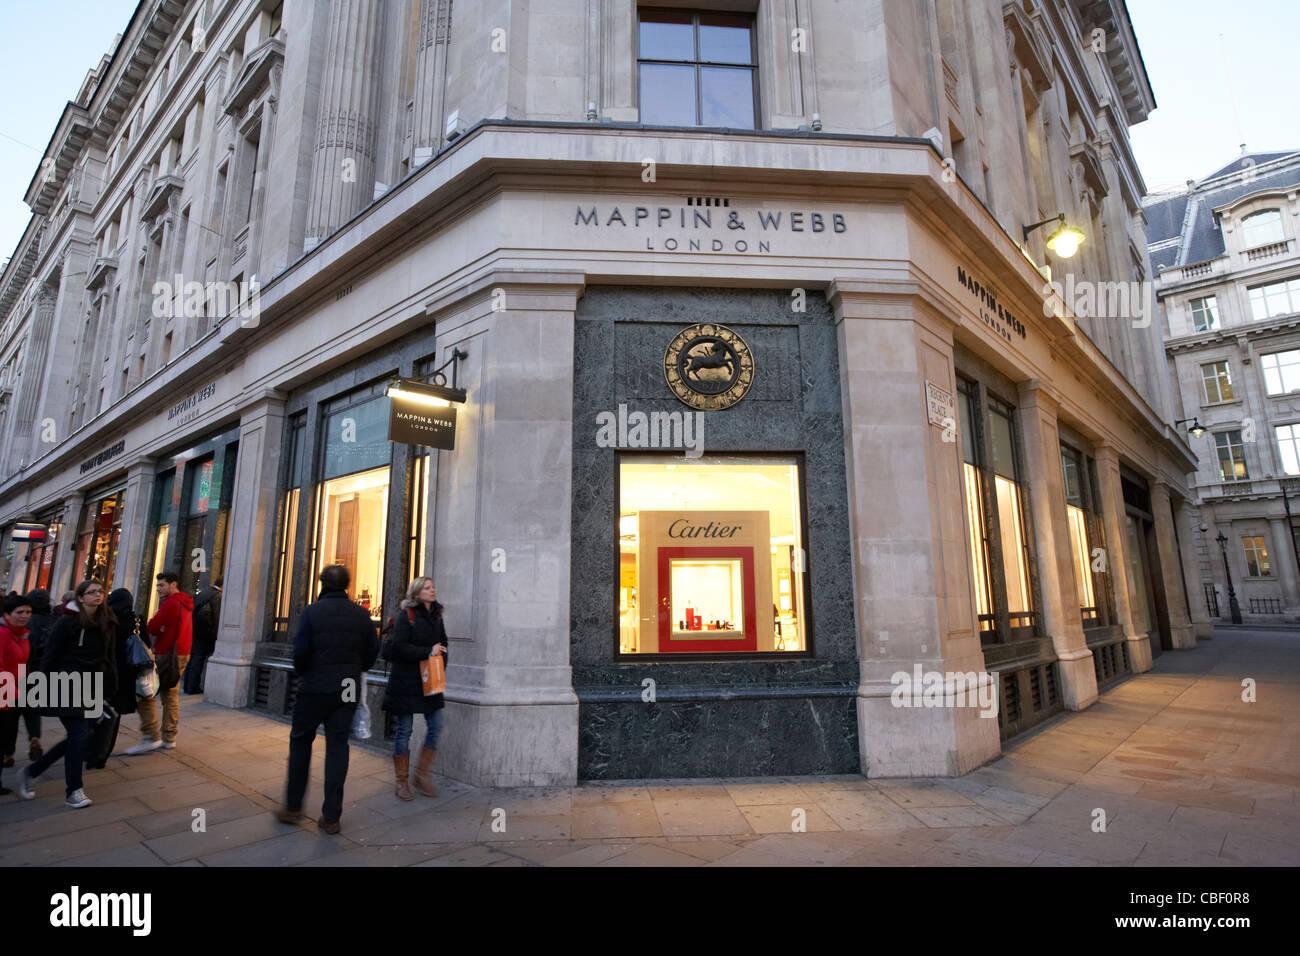 mappin and webb exclusive jeweller regent street london england uk united kingdom - Stock Image